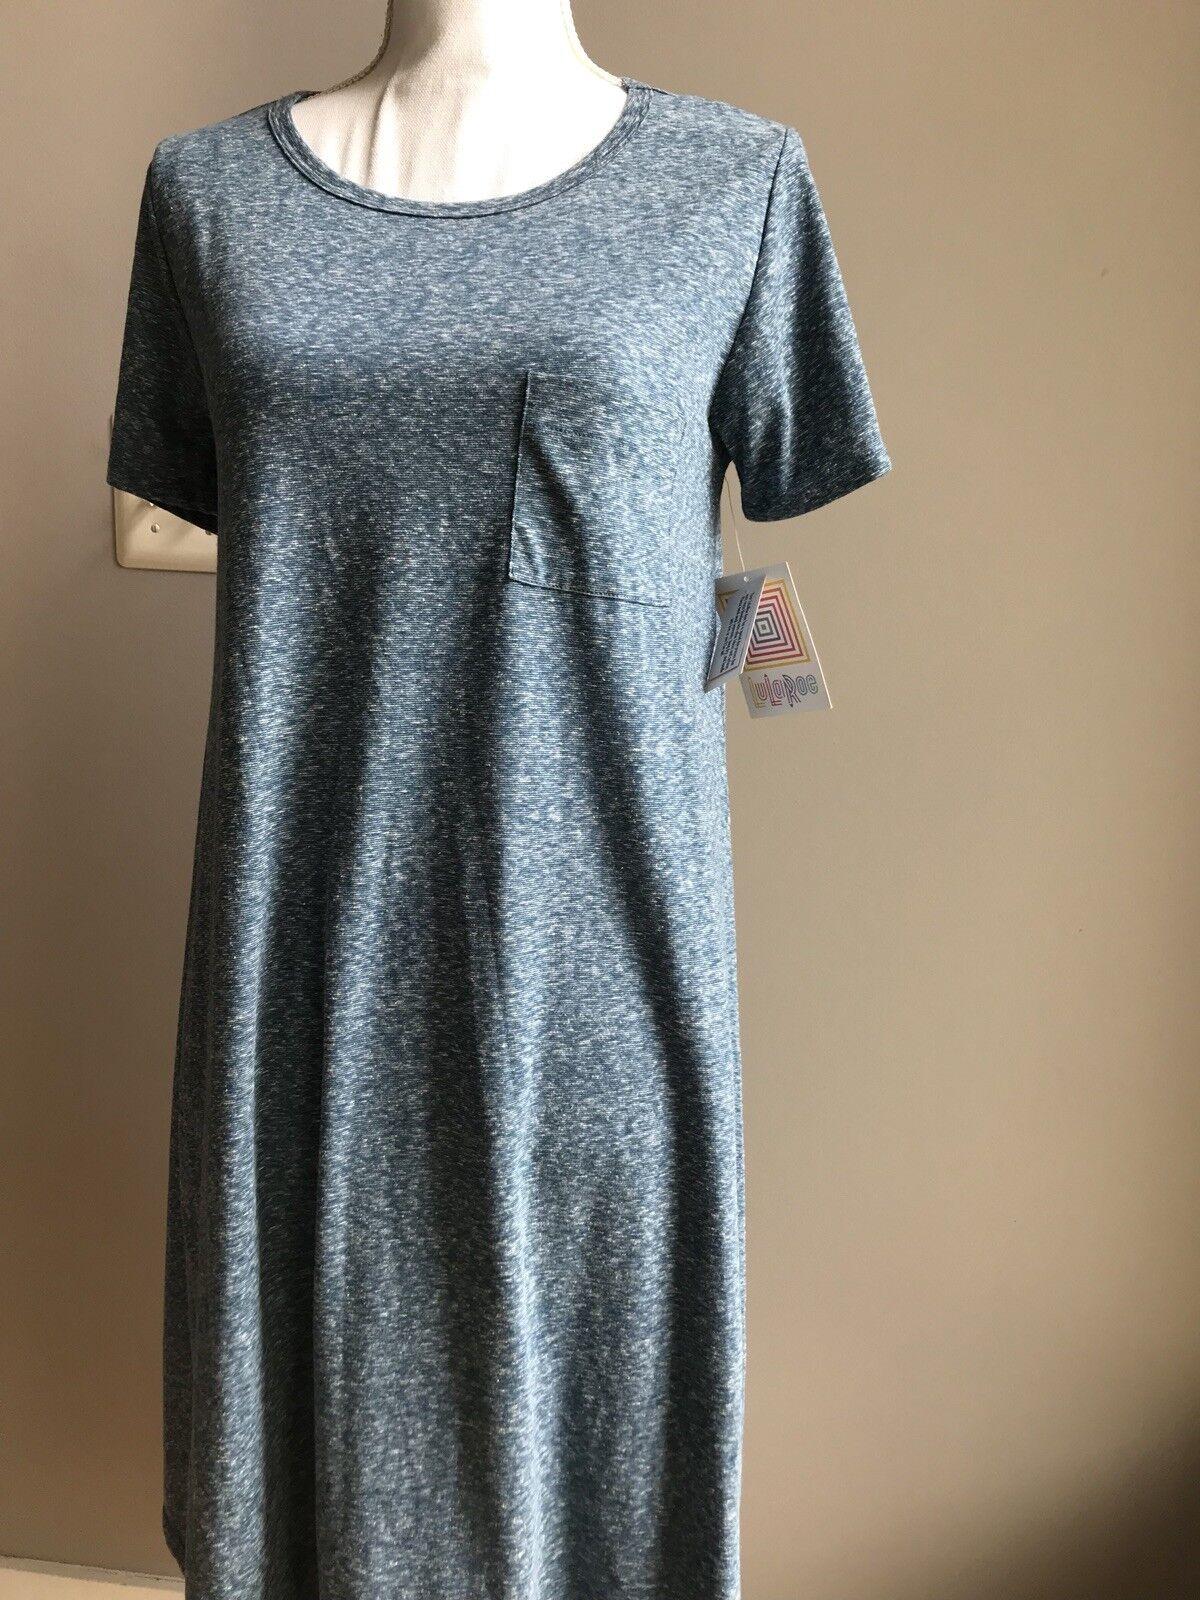 Medium LuLaRoe Carly Dress Pocket Blau Micro Stripes NWT New M